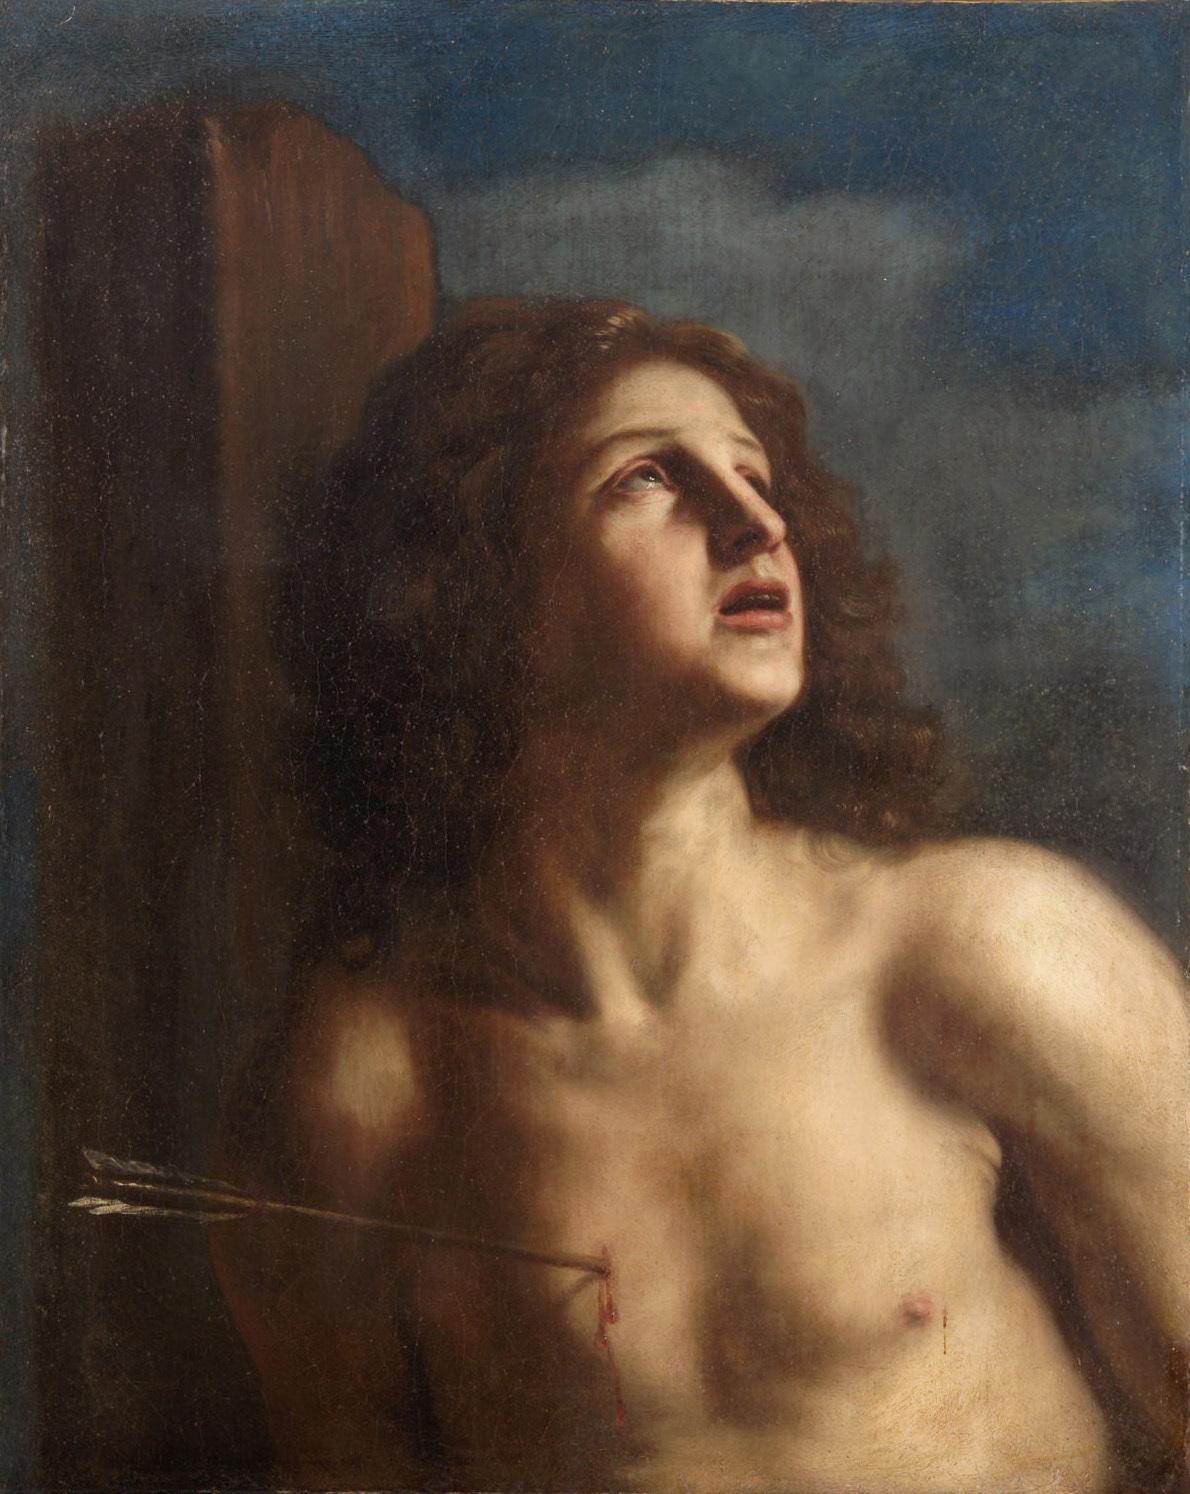 Hl. Sebastian von Giovanni Francesco Barbieri, gen. Il Guercino